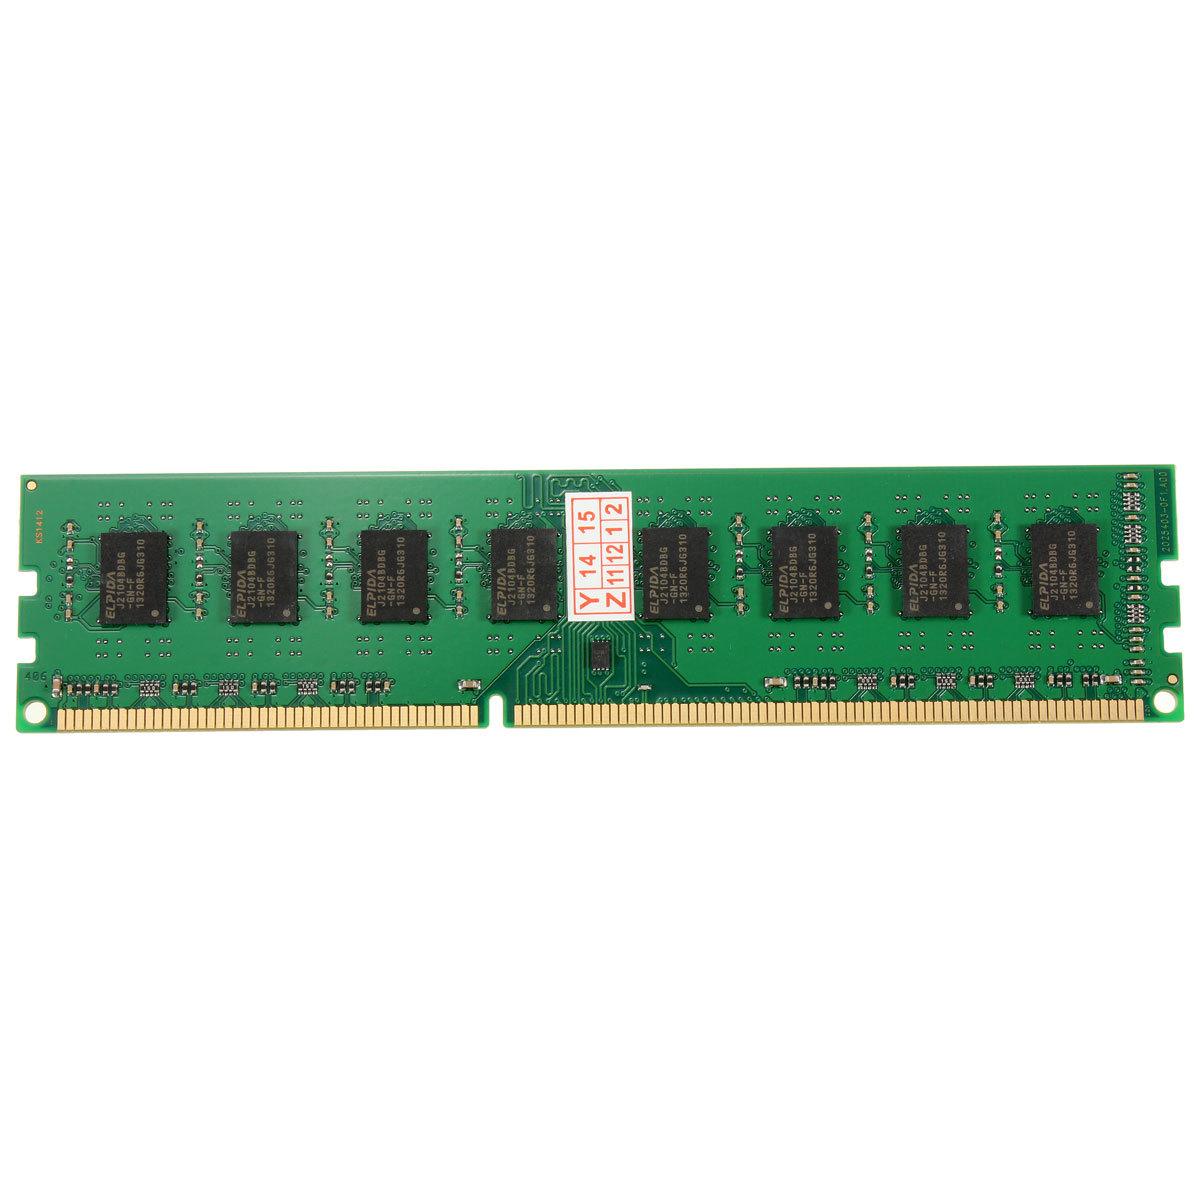 Harga Saya 4gb Ddr3 Pc3 12800 1600mhz Desktop Pc Dimm Memory Ram 240 Pc12800 Elpida Pins Foramd System